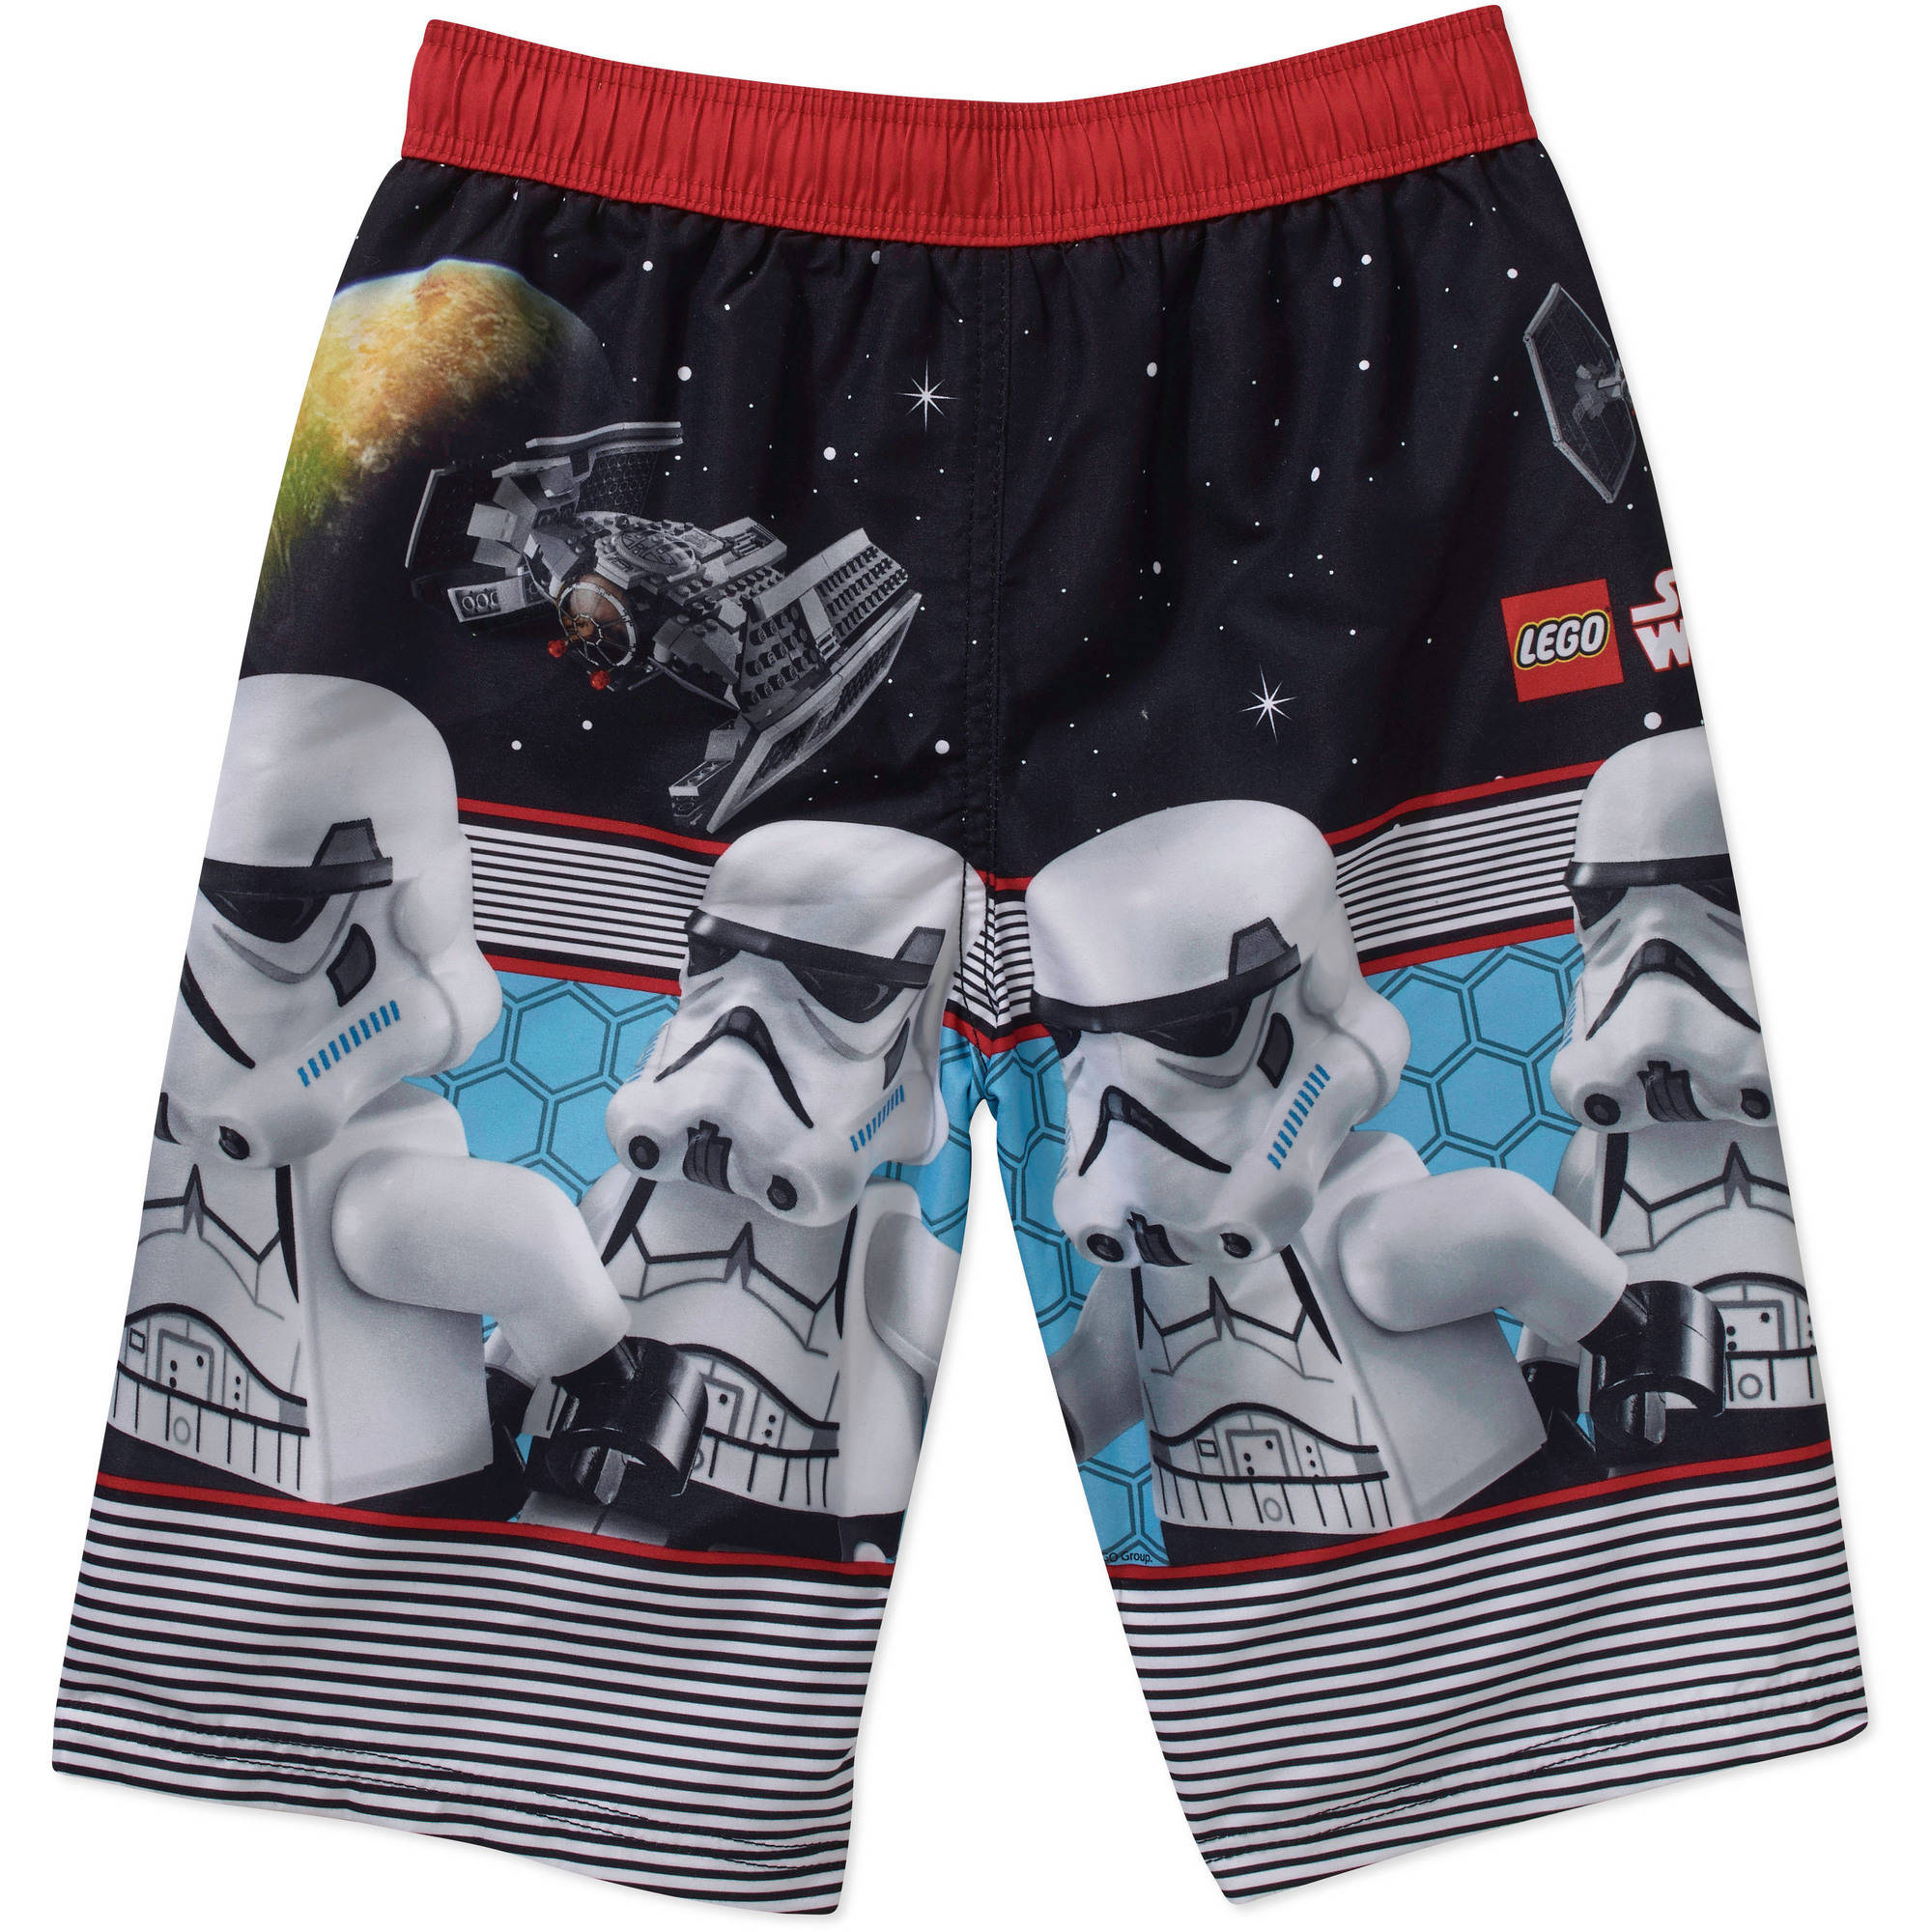 Isaac Morris Star Wars Lego Darth Vader Boardshort Swim Trunk